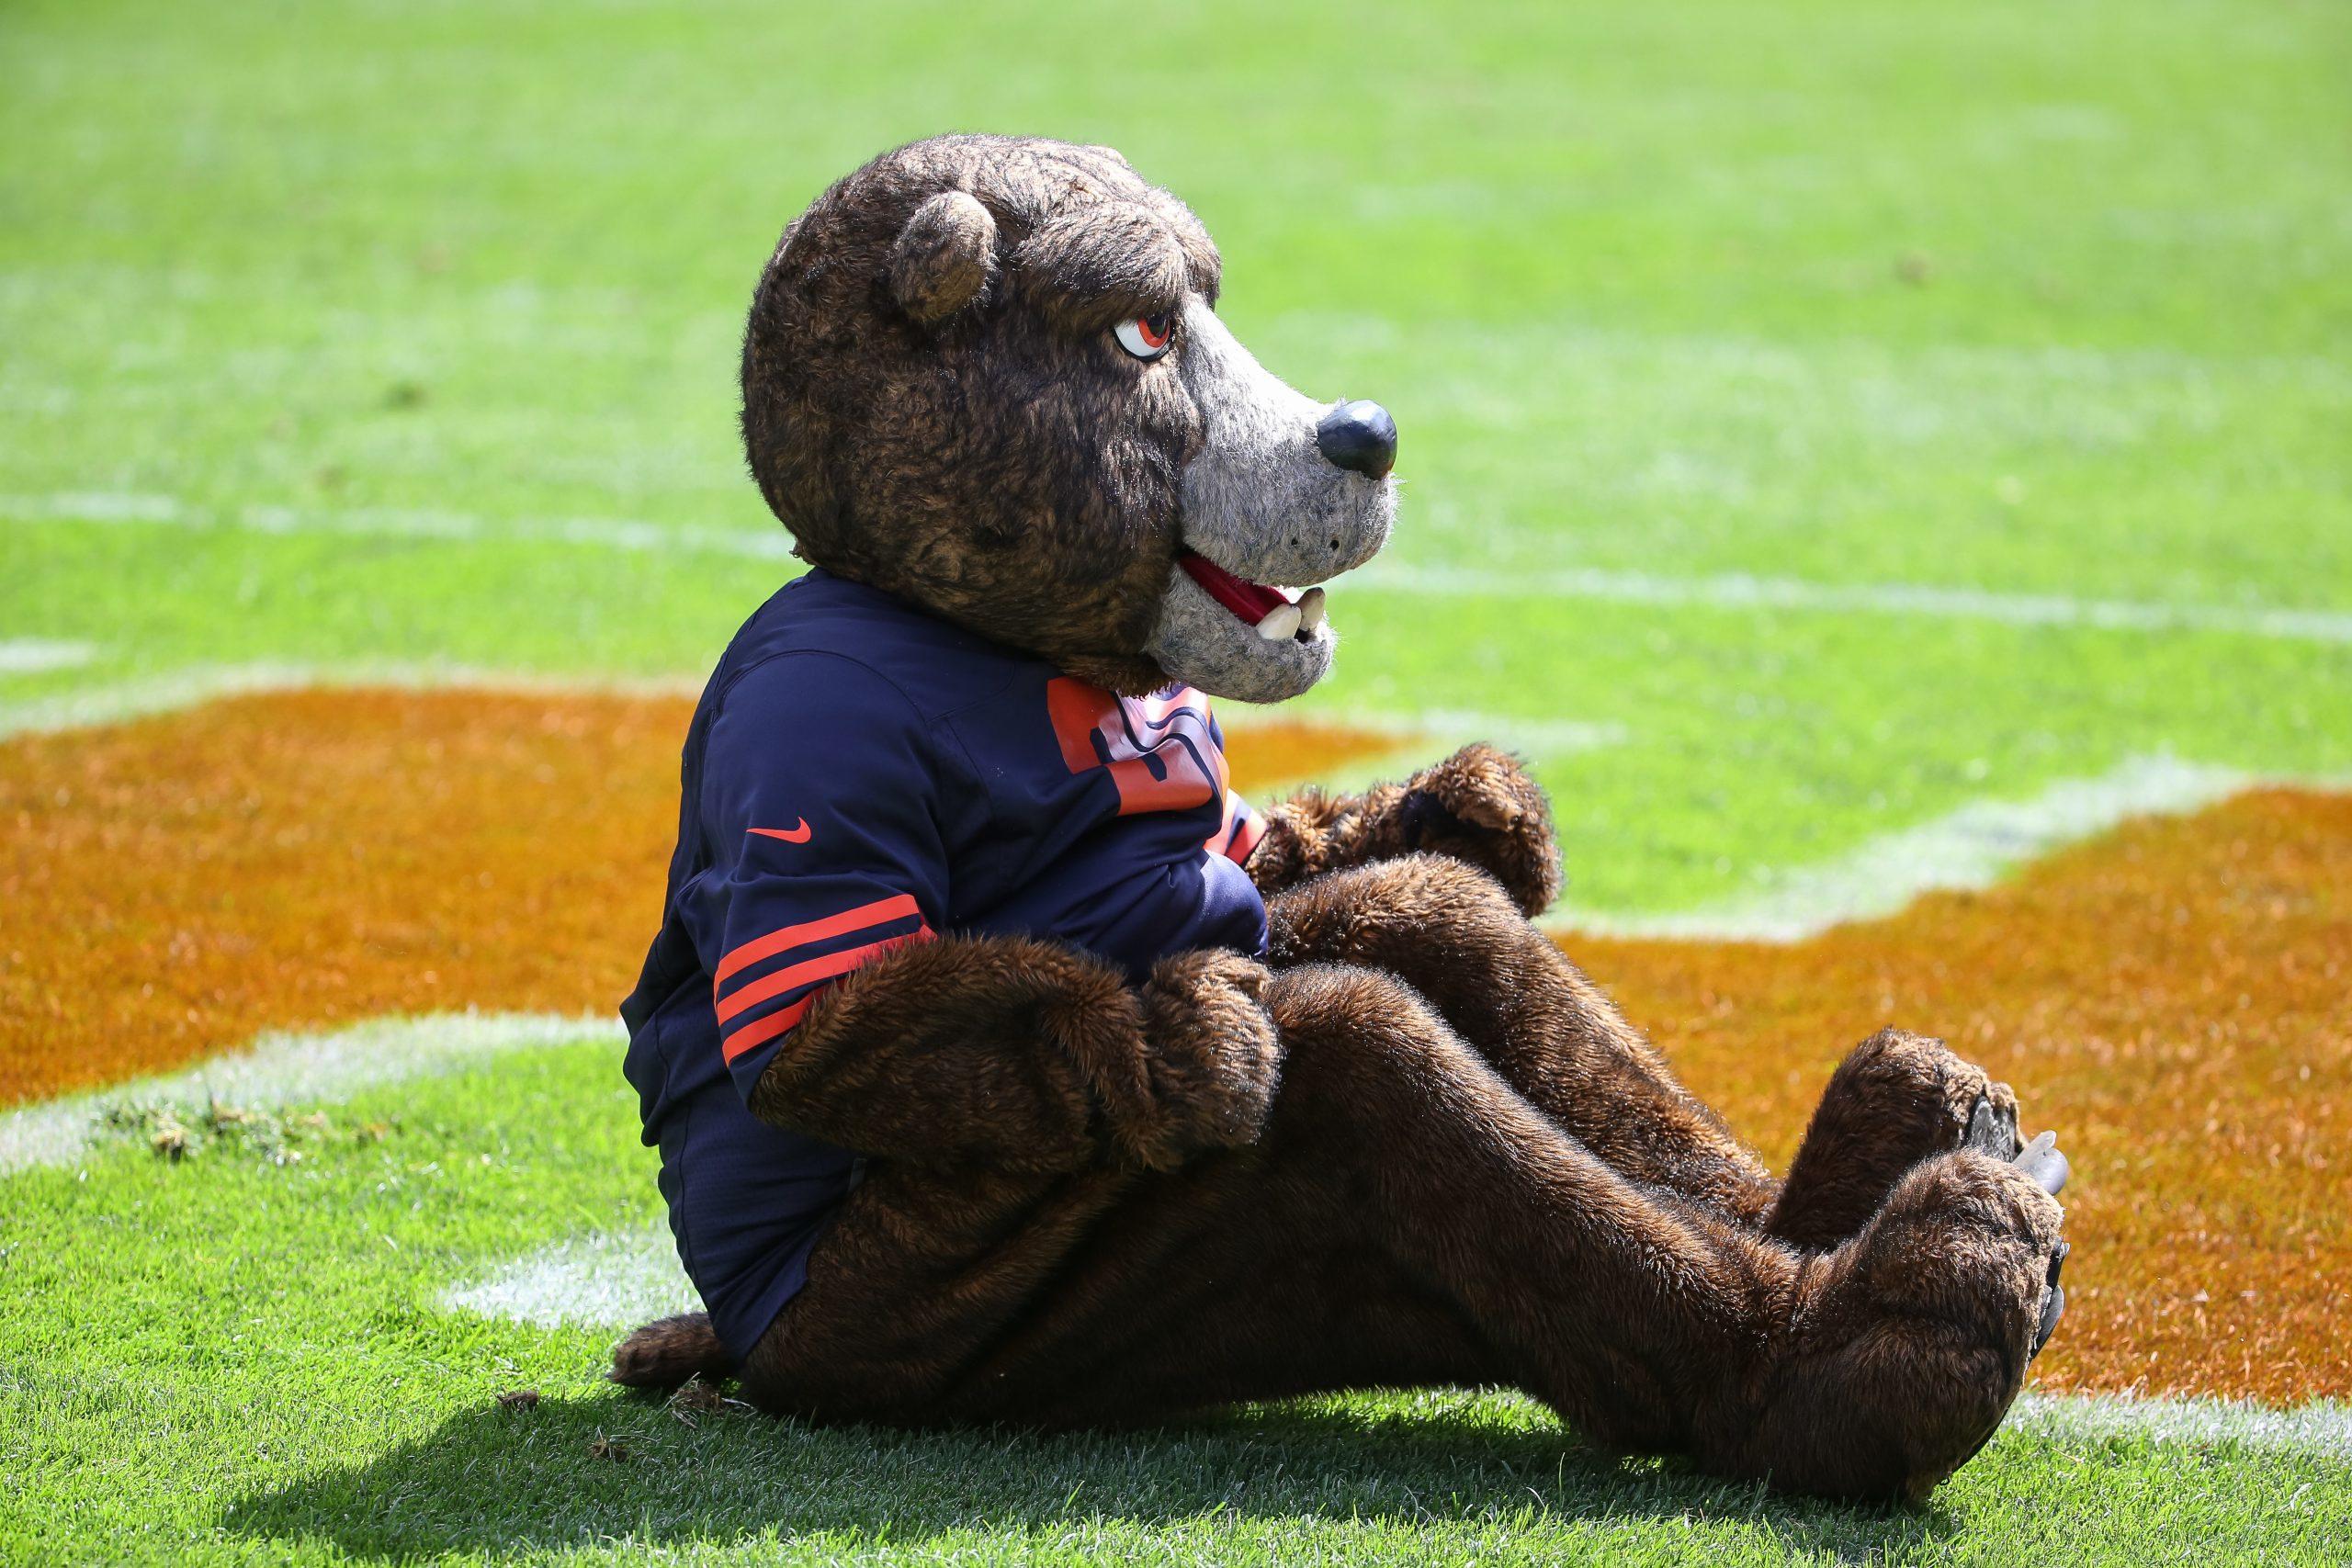 CBS has blocked an advertising Medical Marijuana of games during the Super Bowl